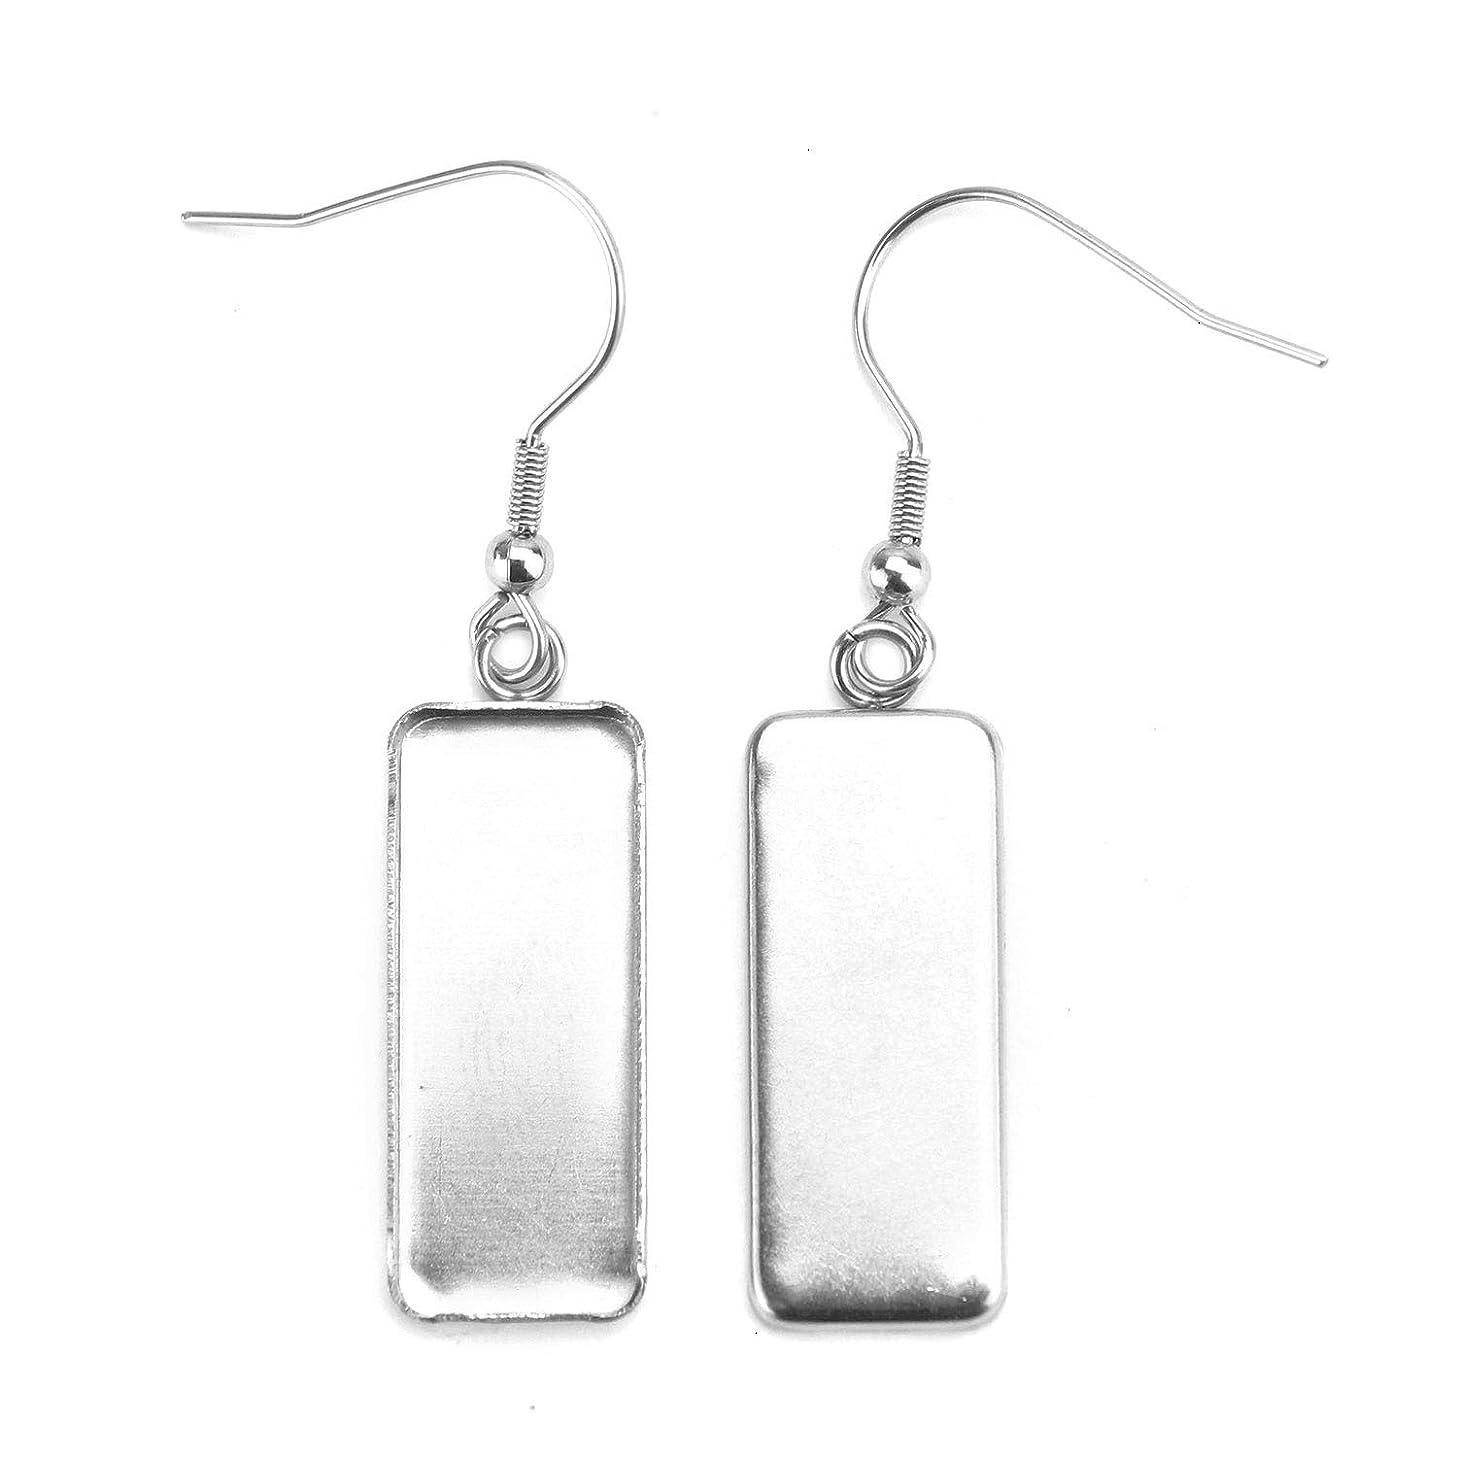 Monrocco 20Pcs Cabochon Earring Settings, Earring Blanks Earring Wire Hooks Blanks for 25mm x 10mm Cabochon Settings (Silver)